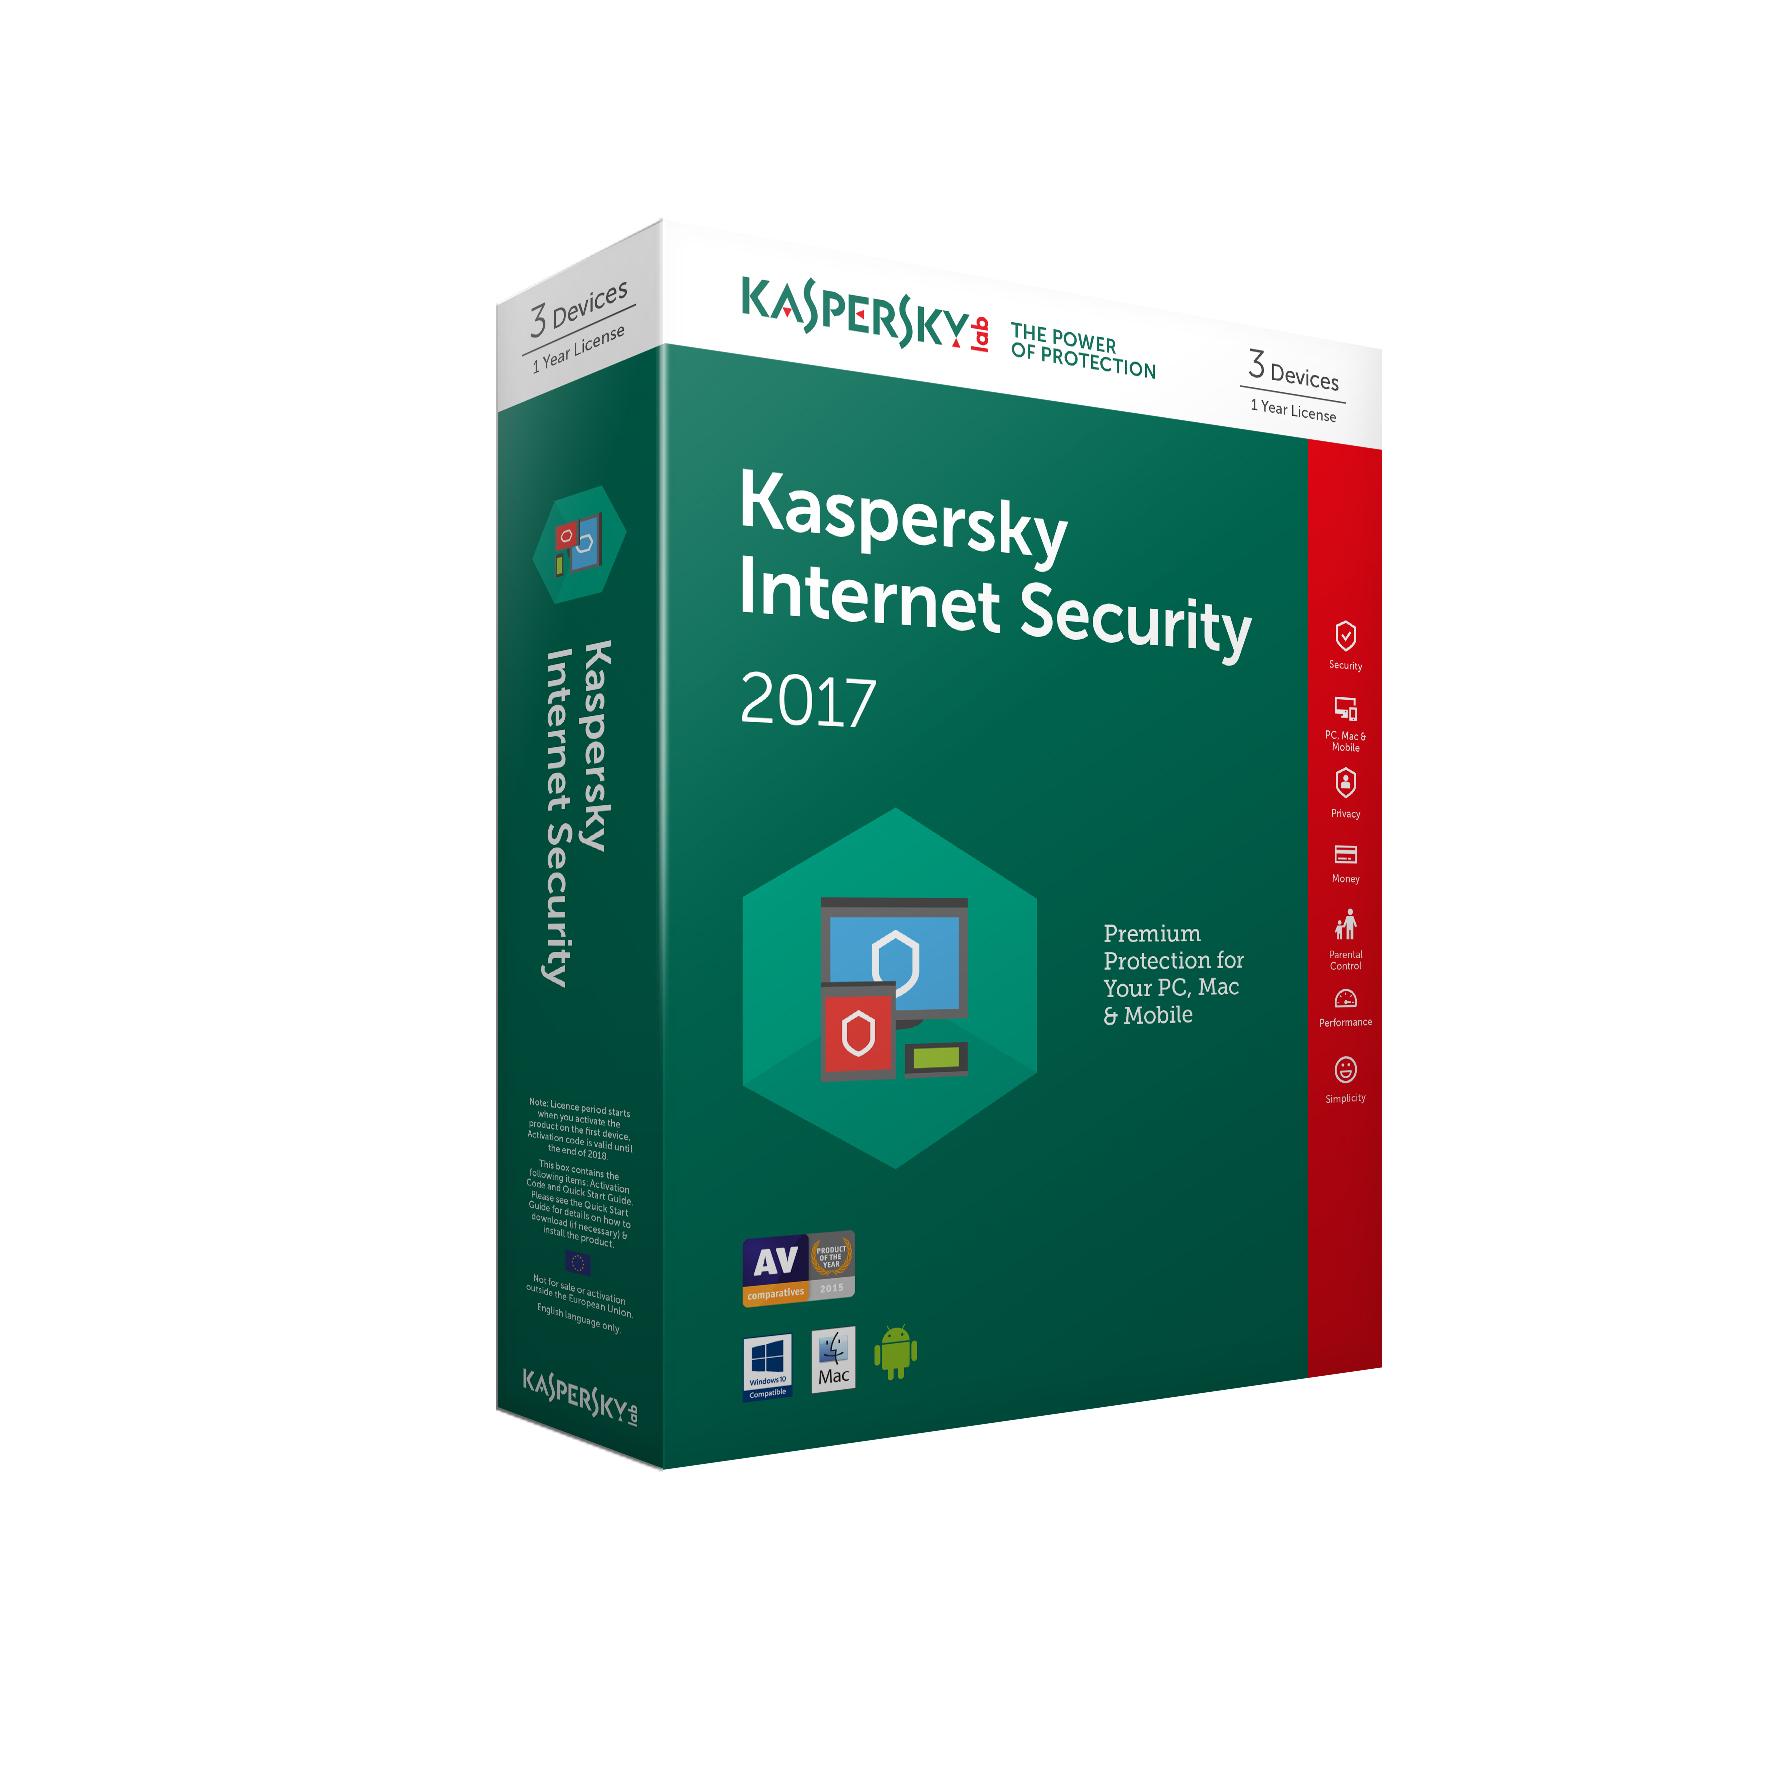 Kaspersky Lab Kaspersky Internet Security 2017 - 3 Devices 1 Year (Standard Packaging)